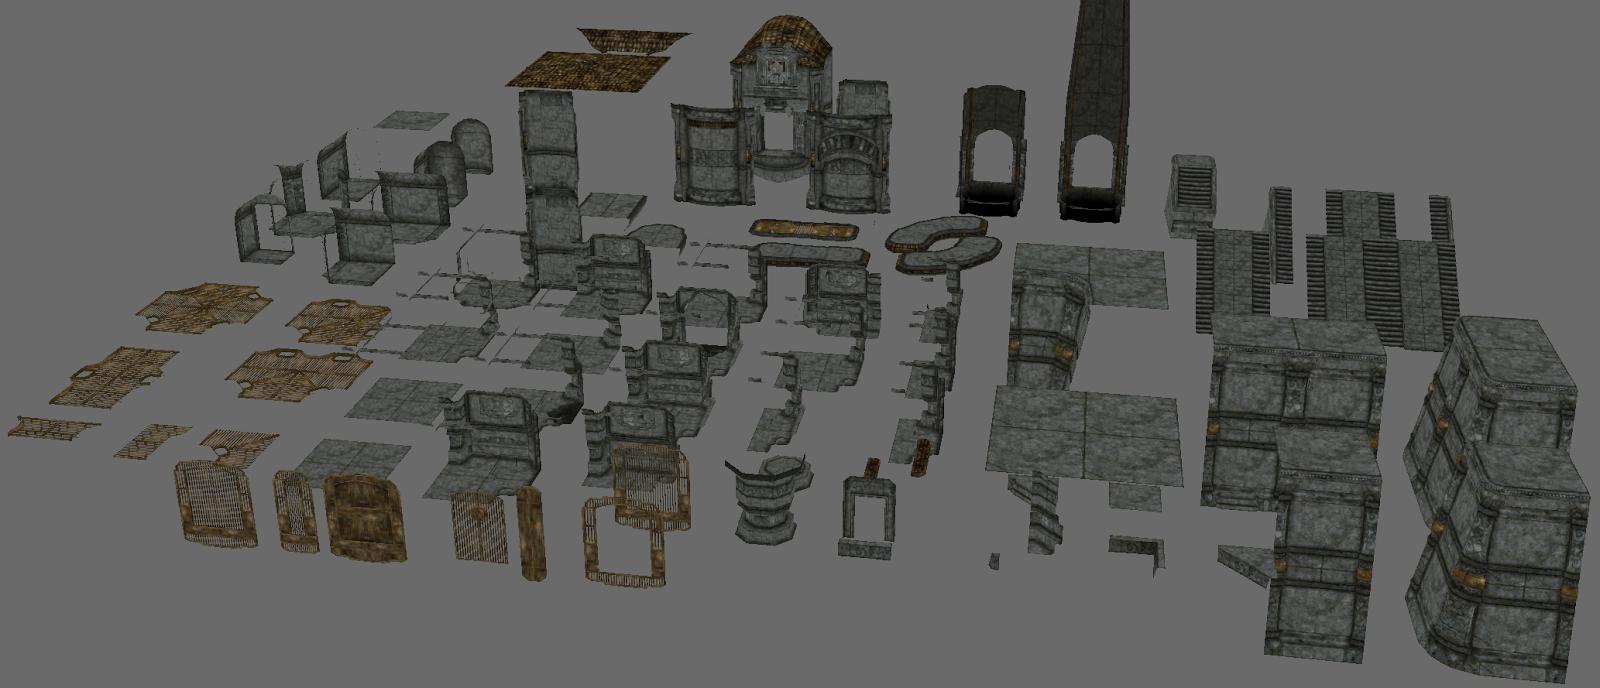 gamasutra joel burgess s blog skyrim s modular approach to level